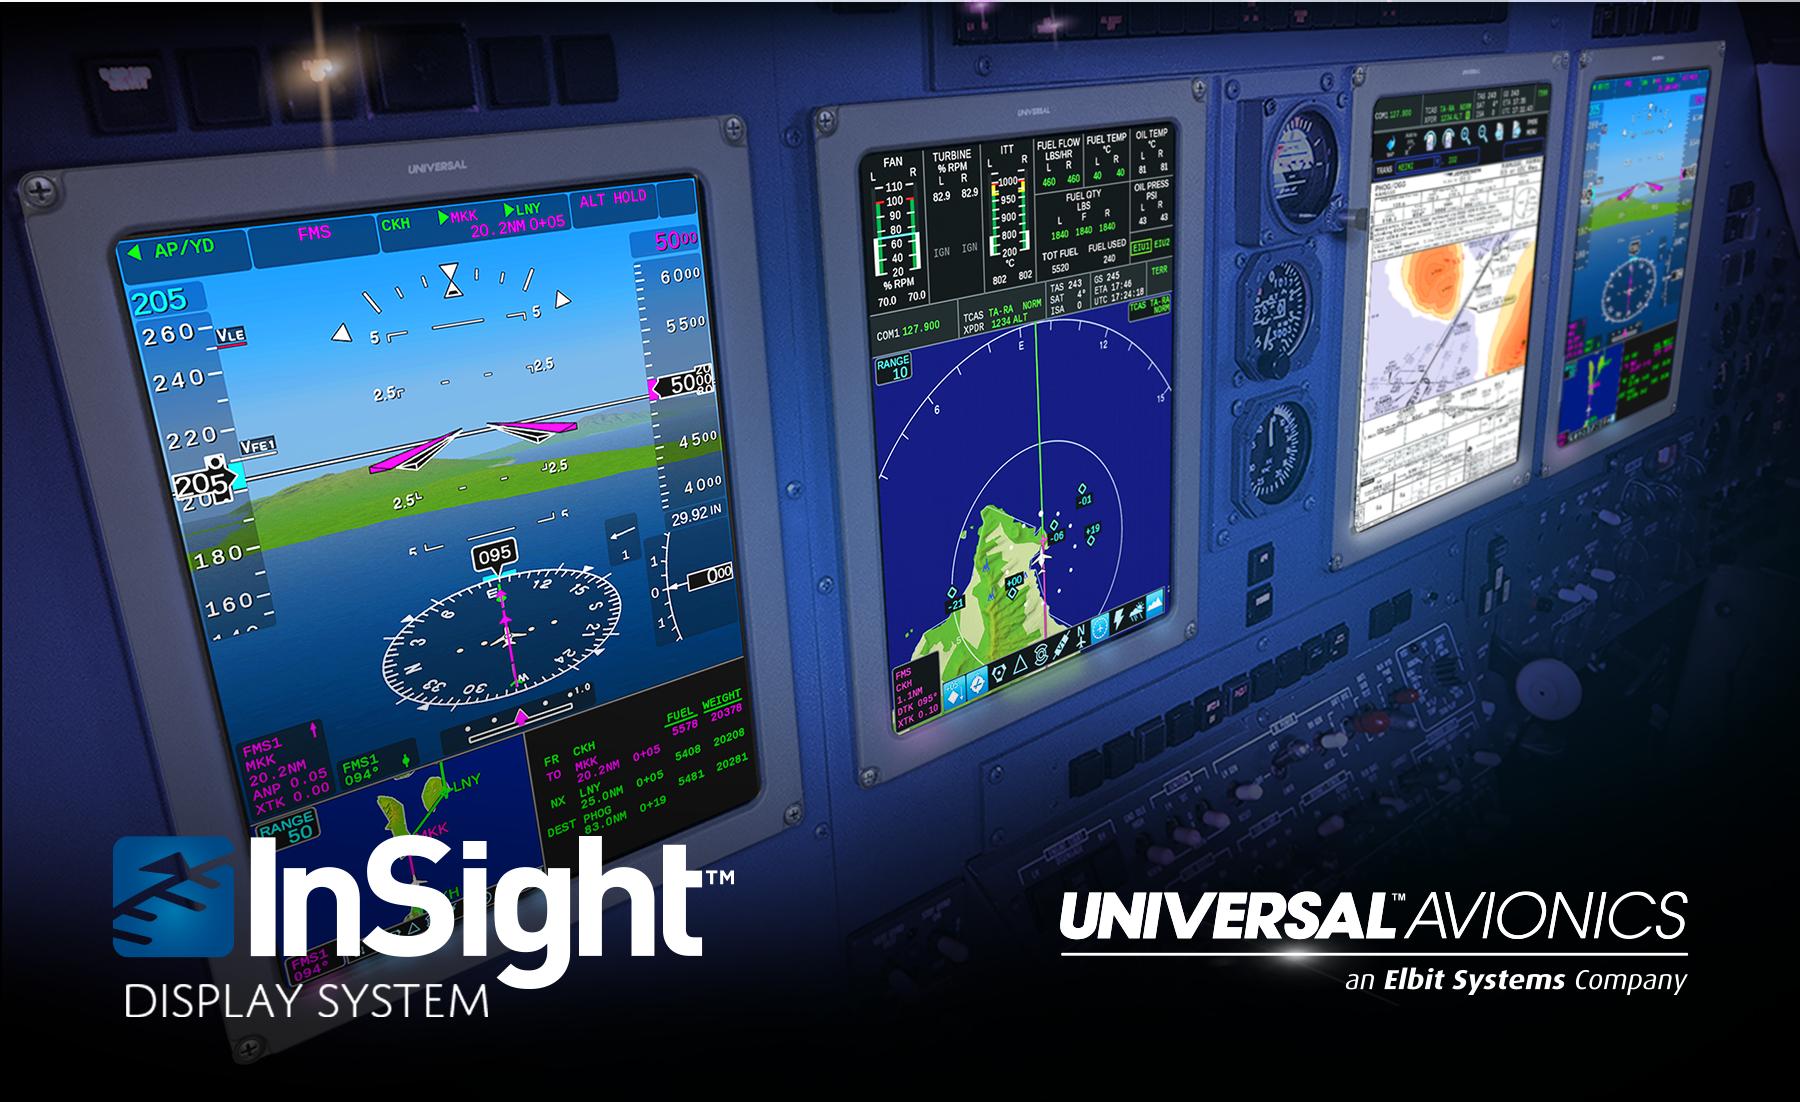 Universal Avionics sees strong year for InSightTM integrated flight deck upgrades